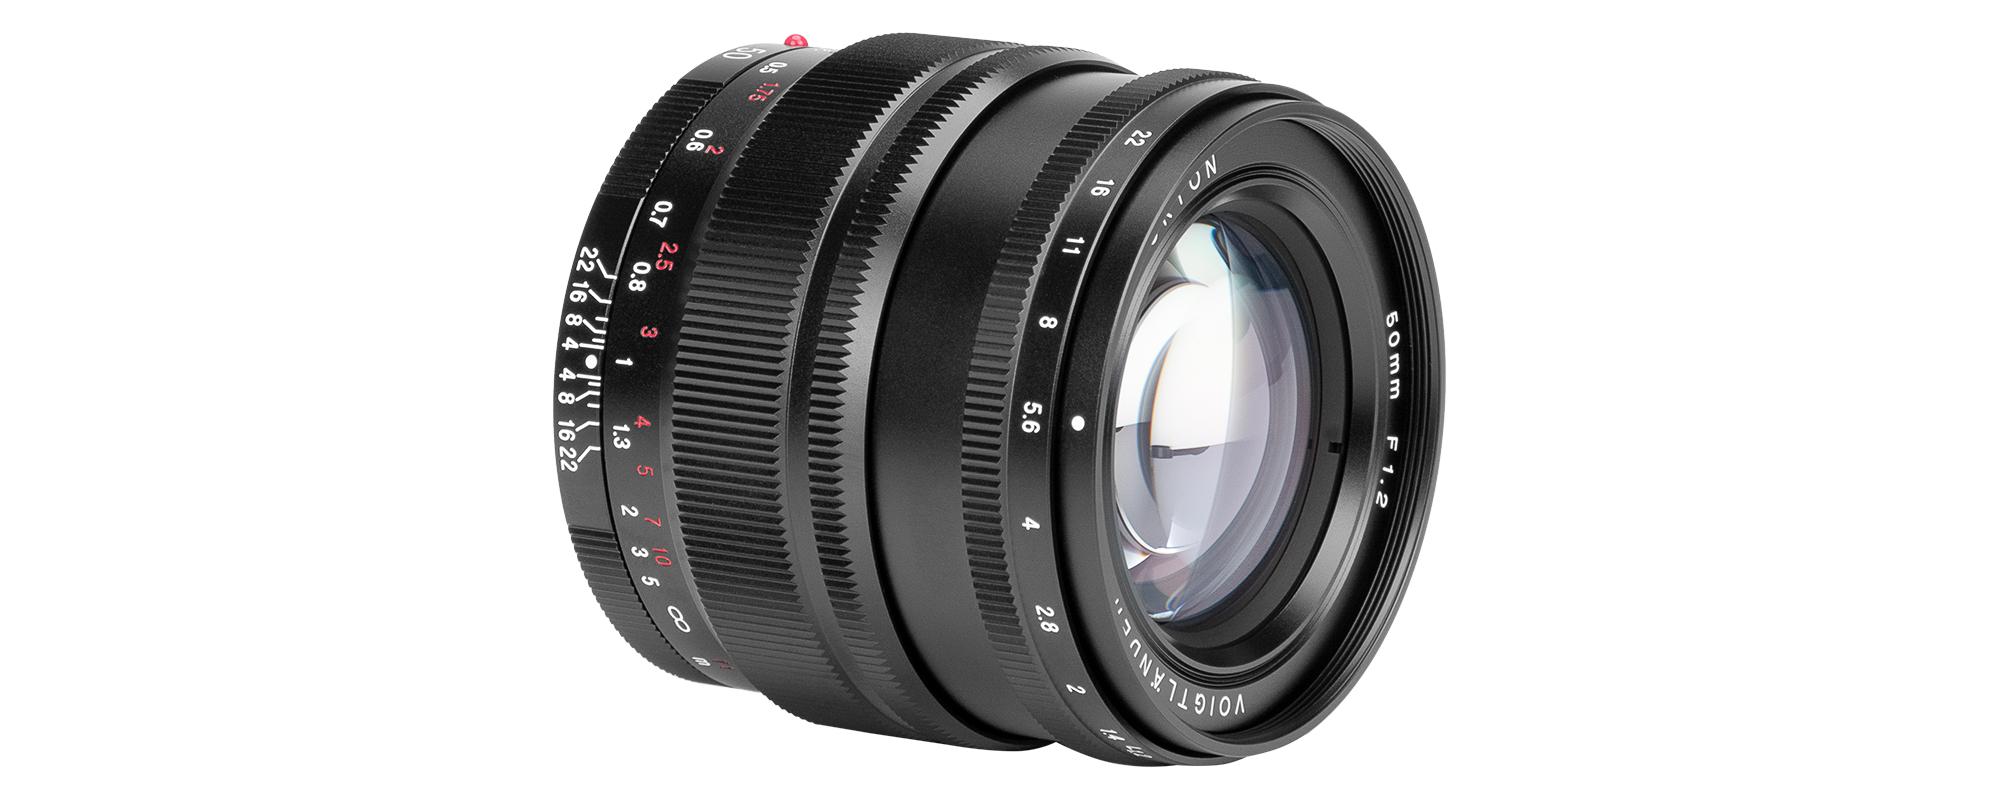 Obiektyw Voigtlander Nokton SE 50 mm f/1,2 do Sony E widok z boku